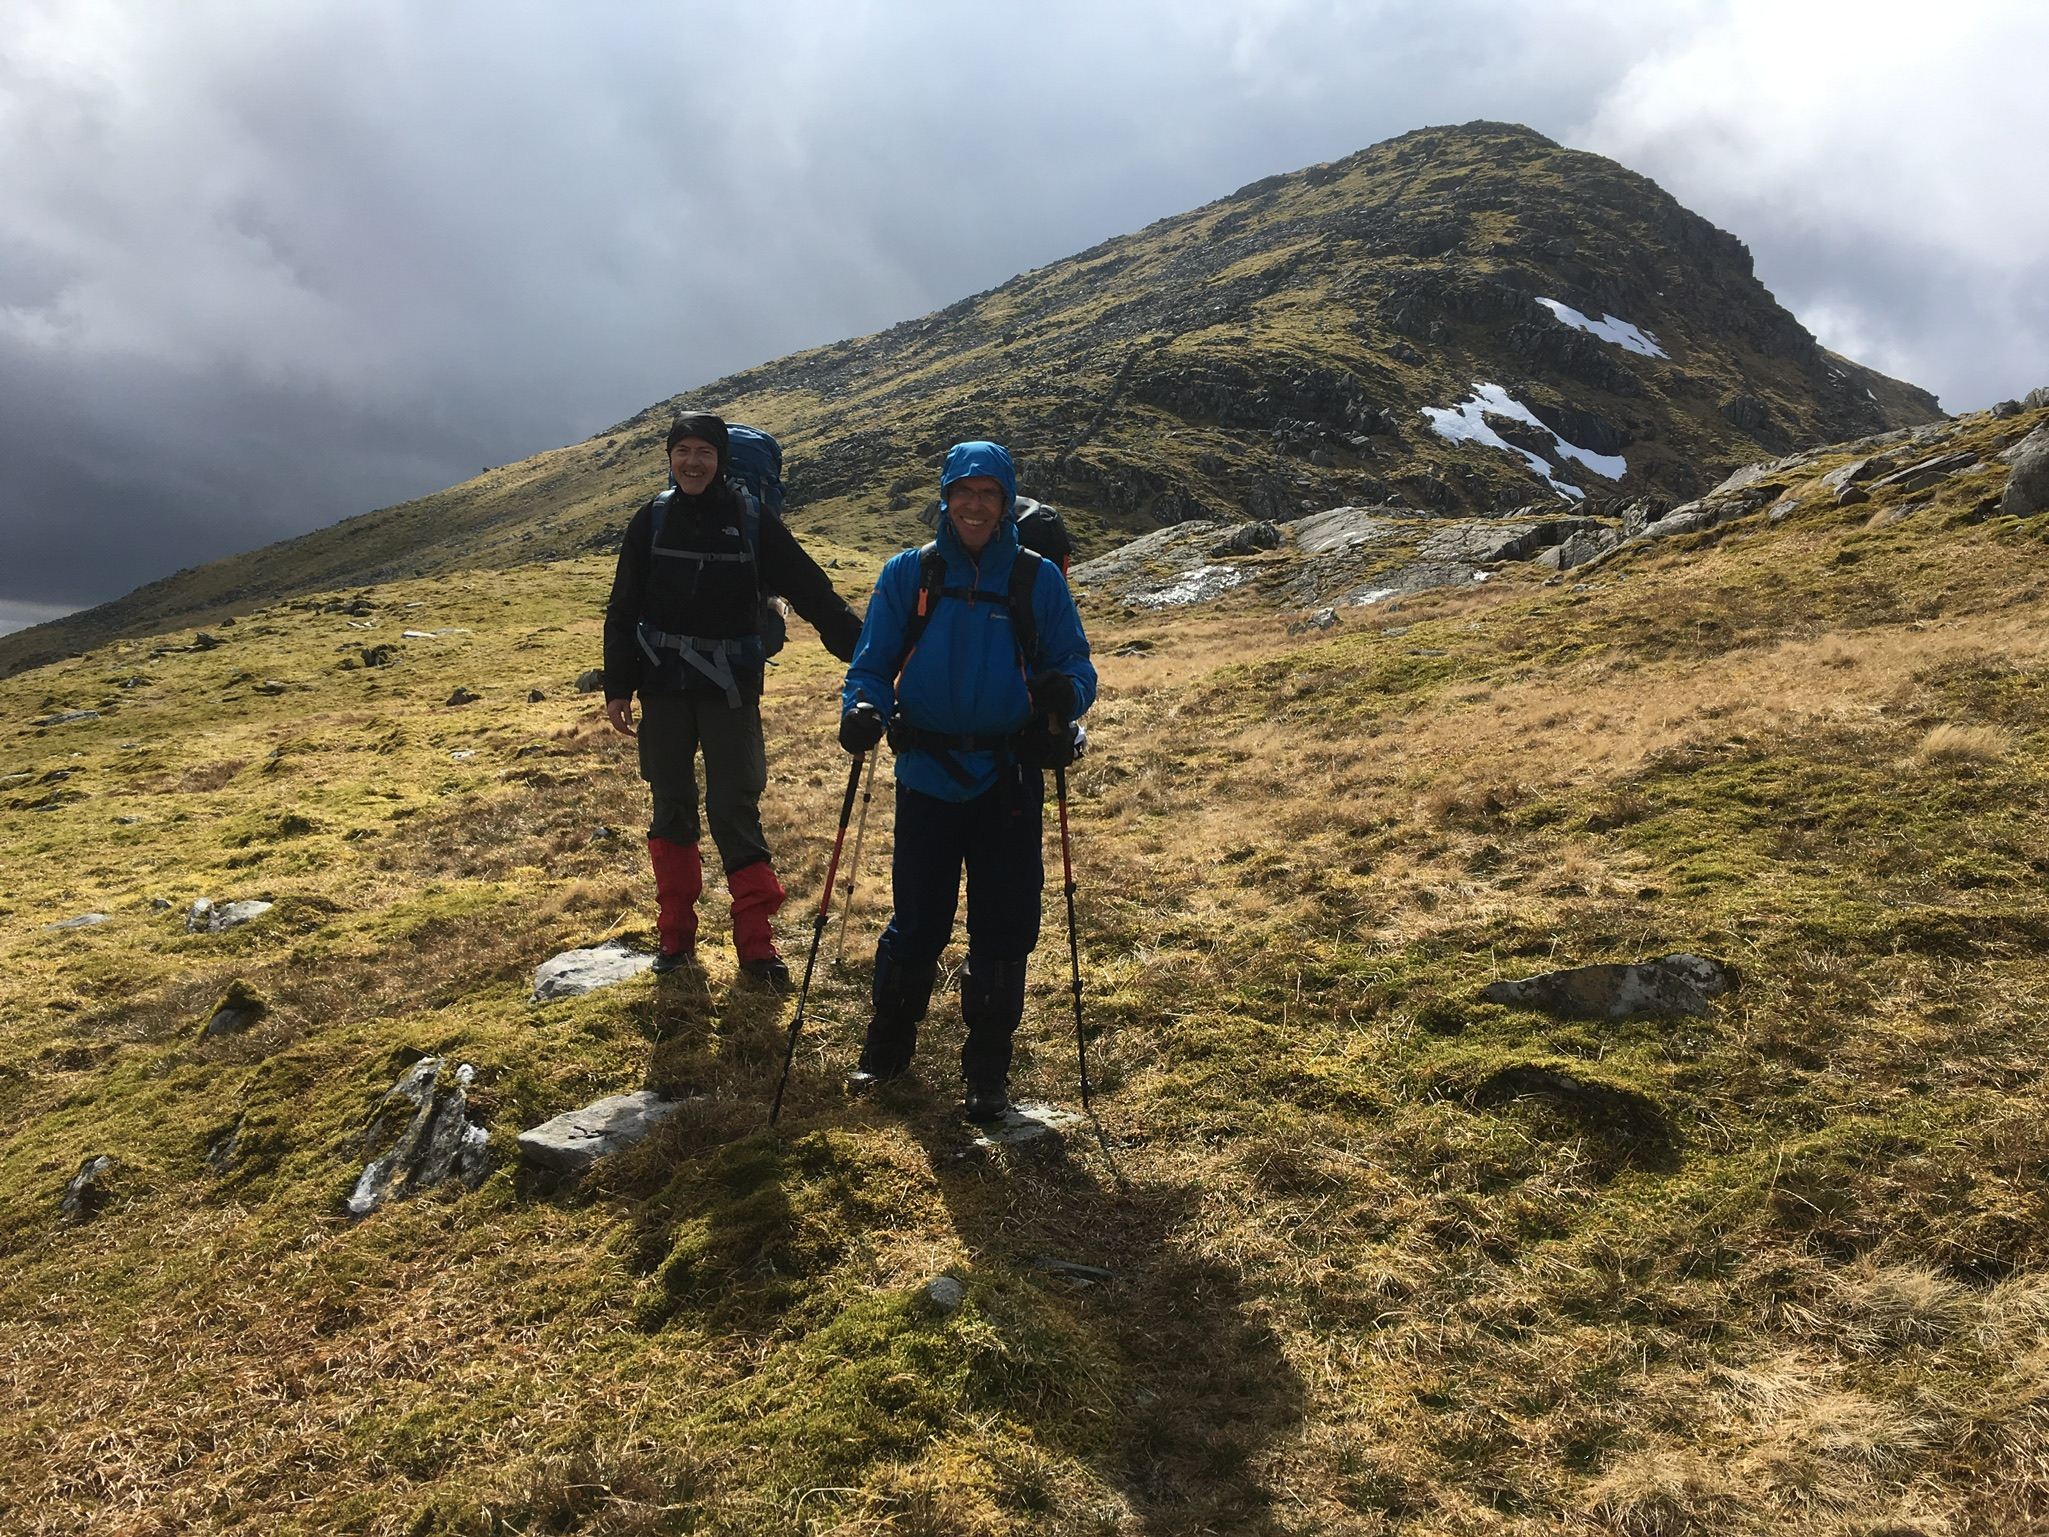 Mountain loch adventure course Scot